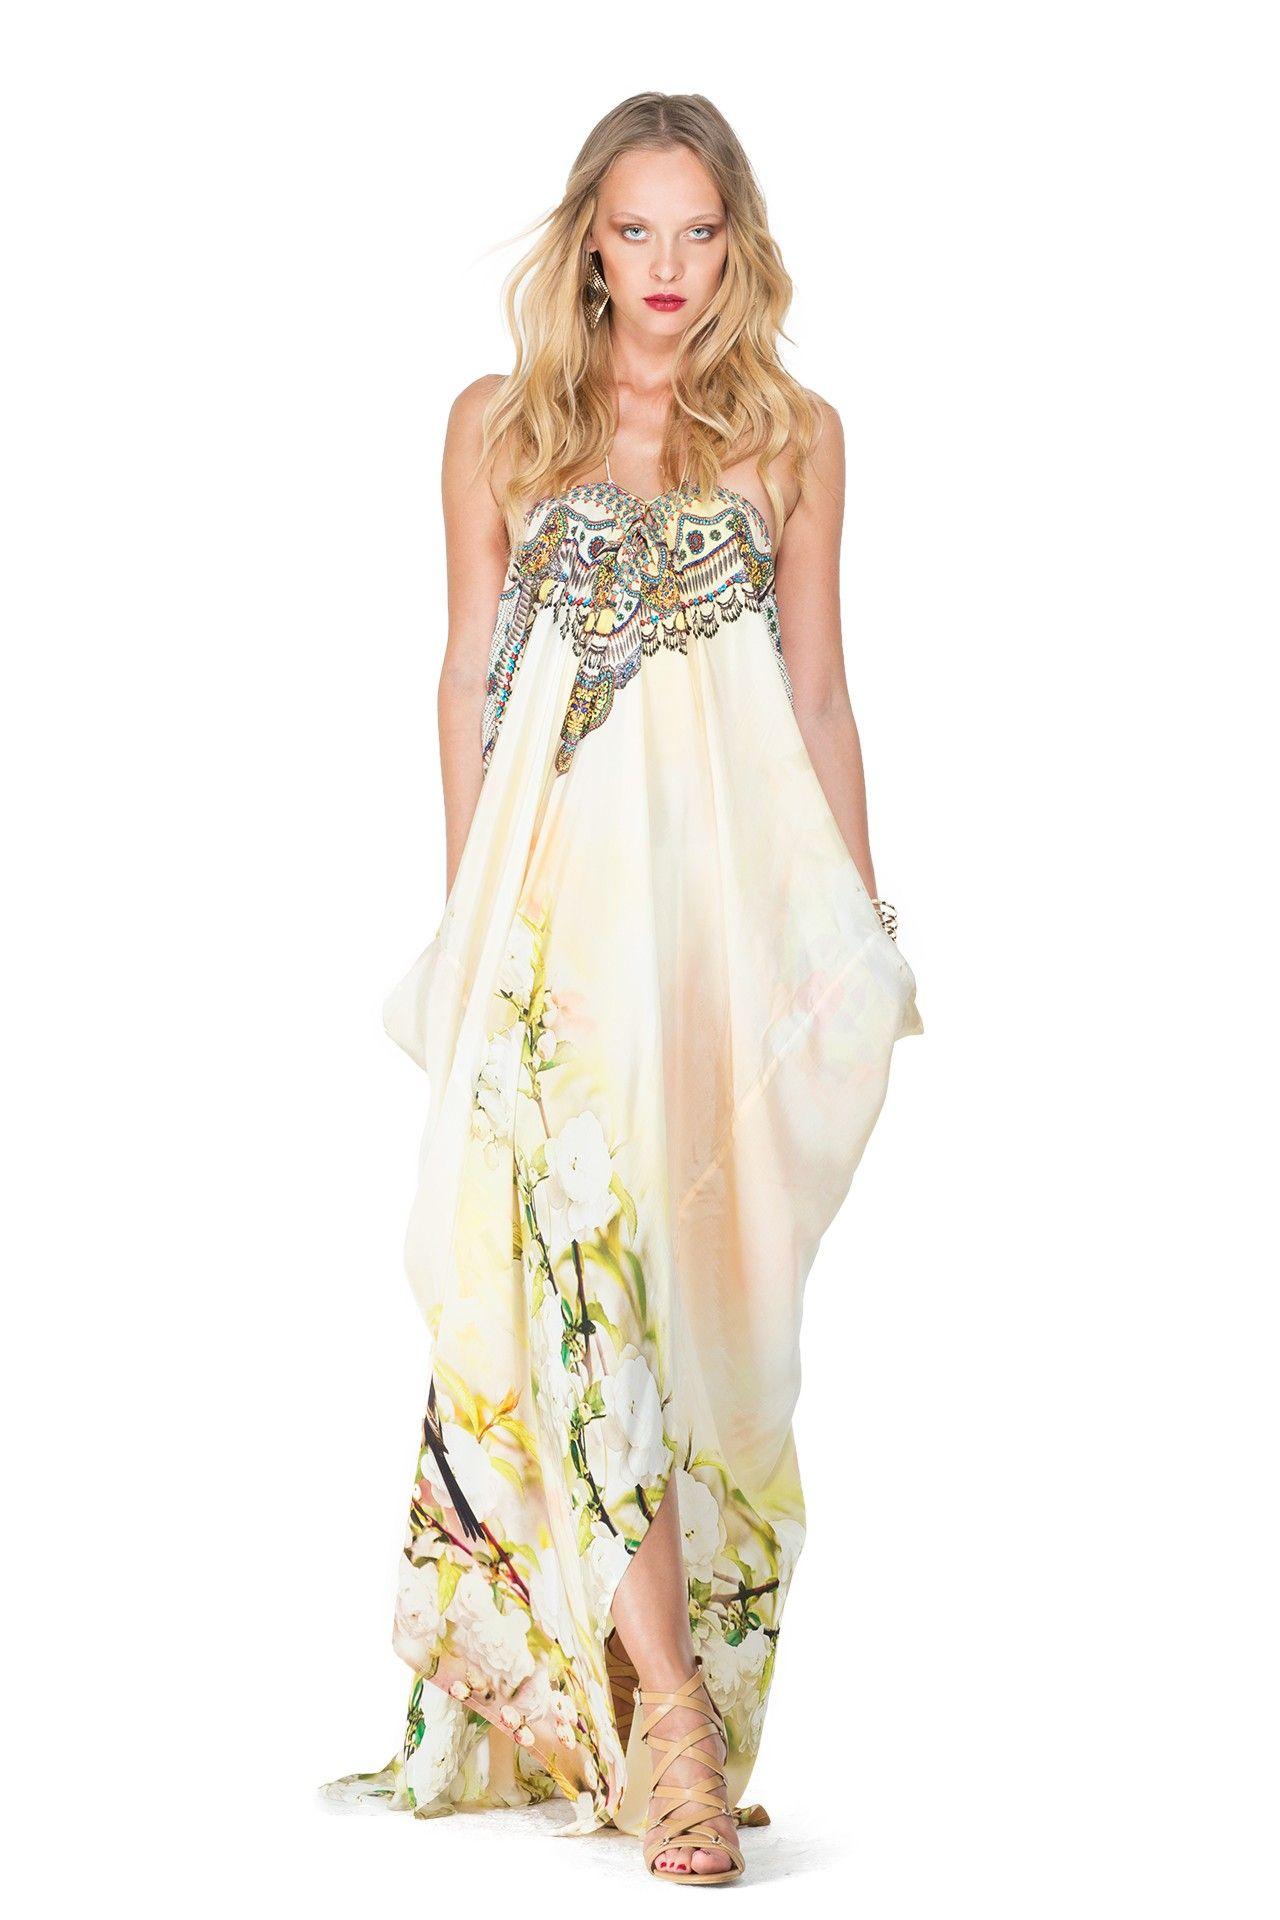 Floral Print Long Lace up Kaftan Dress in Cherry Blossom As seen on Lisa Vanderpump